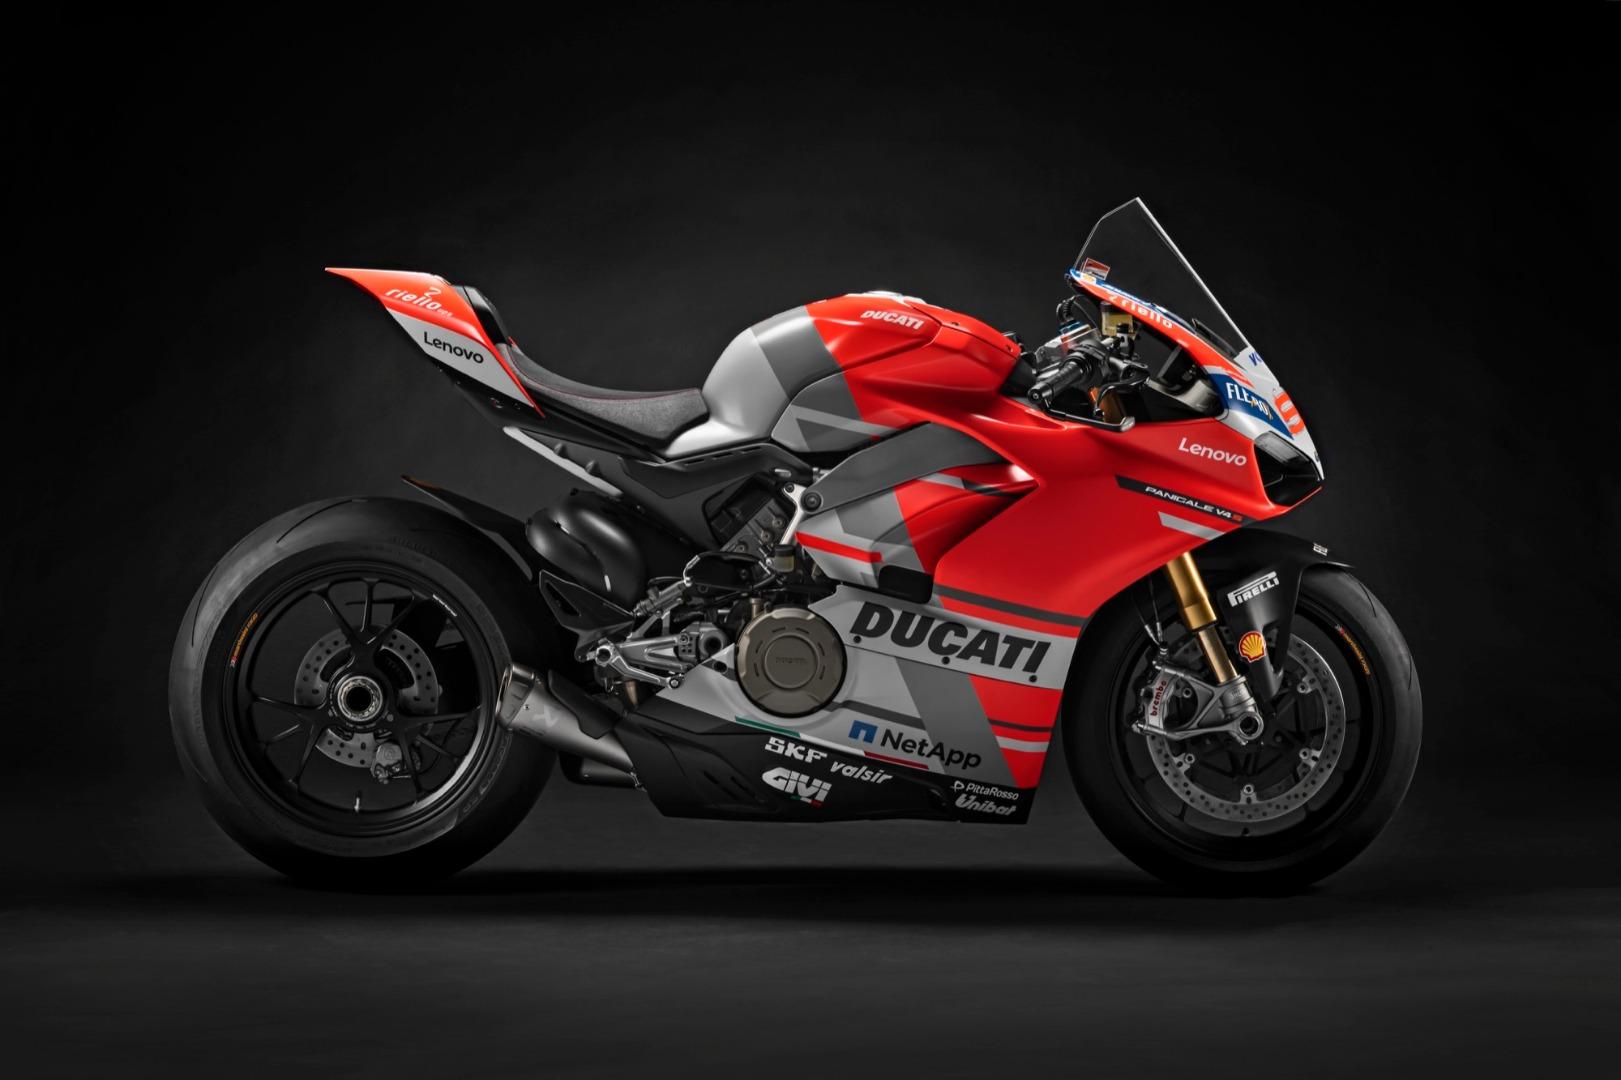 Ducati V4 Panigale Jorge Lorenzo